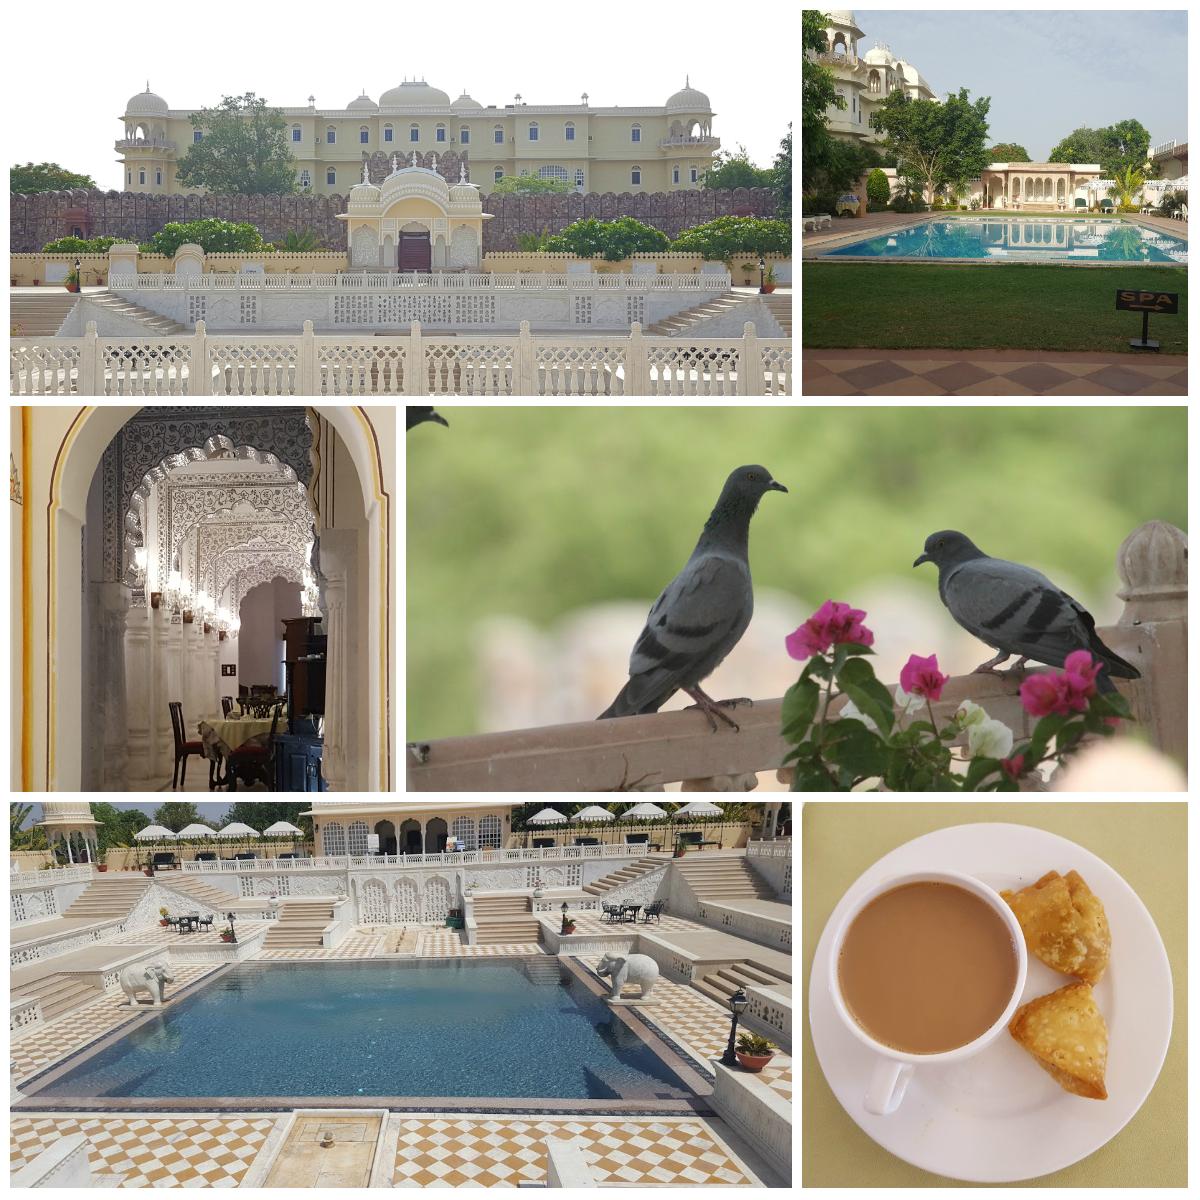 Nahagarh Ranthambore Hotel, Sawai Madhopur, Rajasthan, India